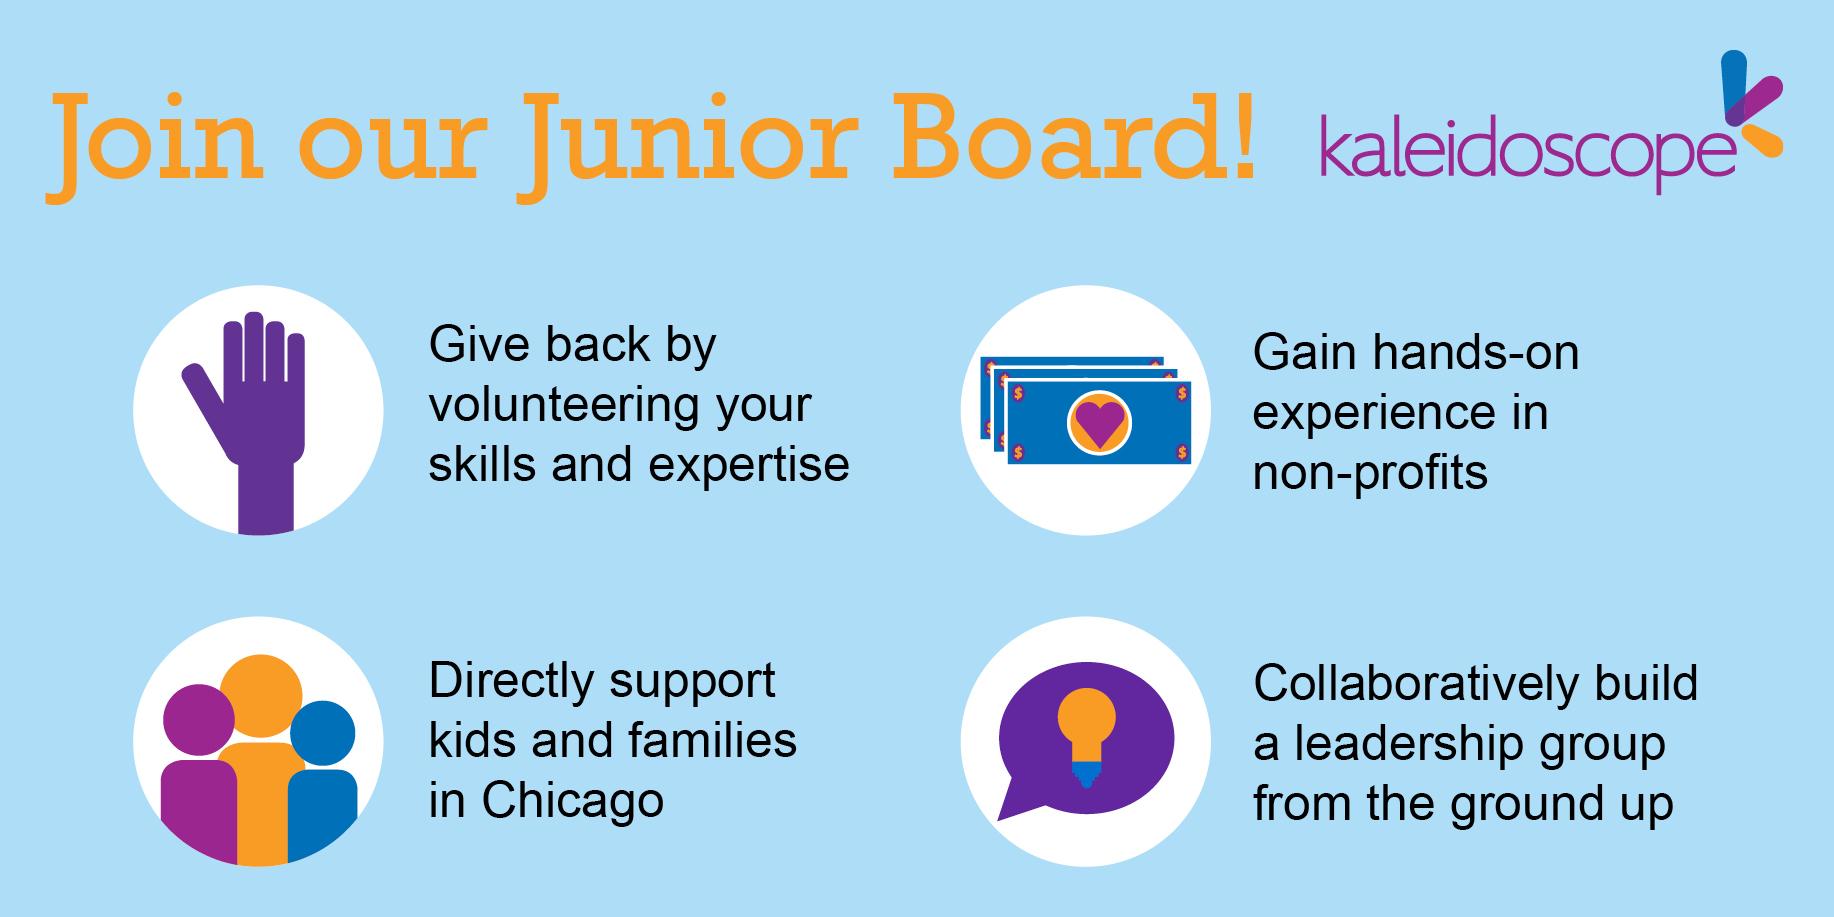 kaleidoscope-fb-preview-junior-board